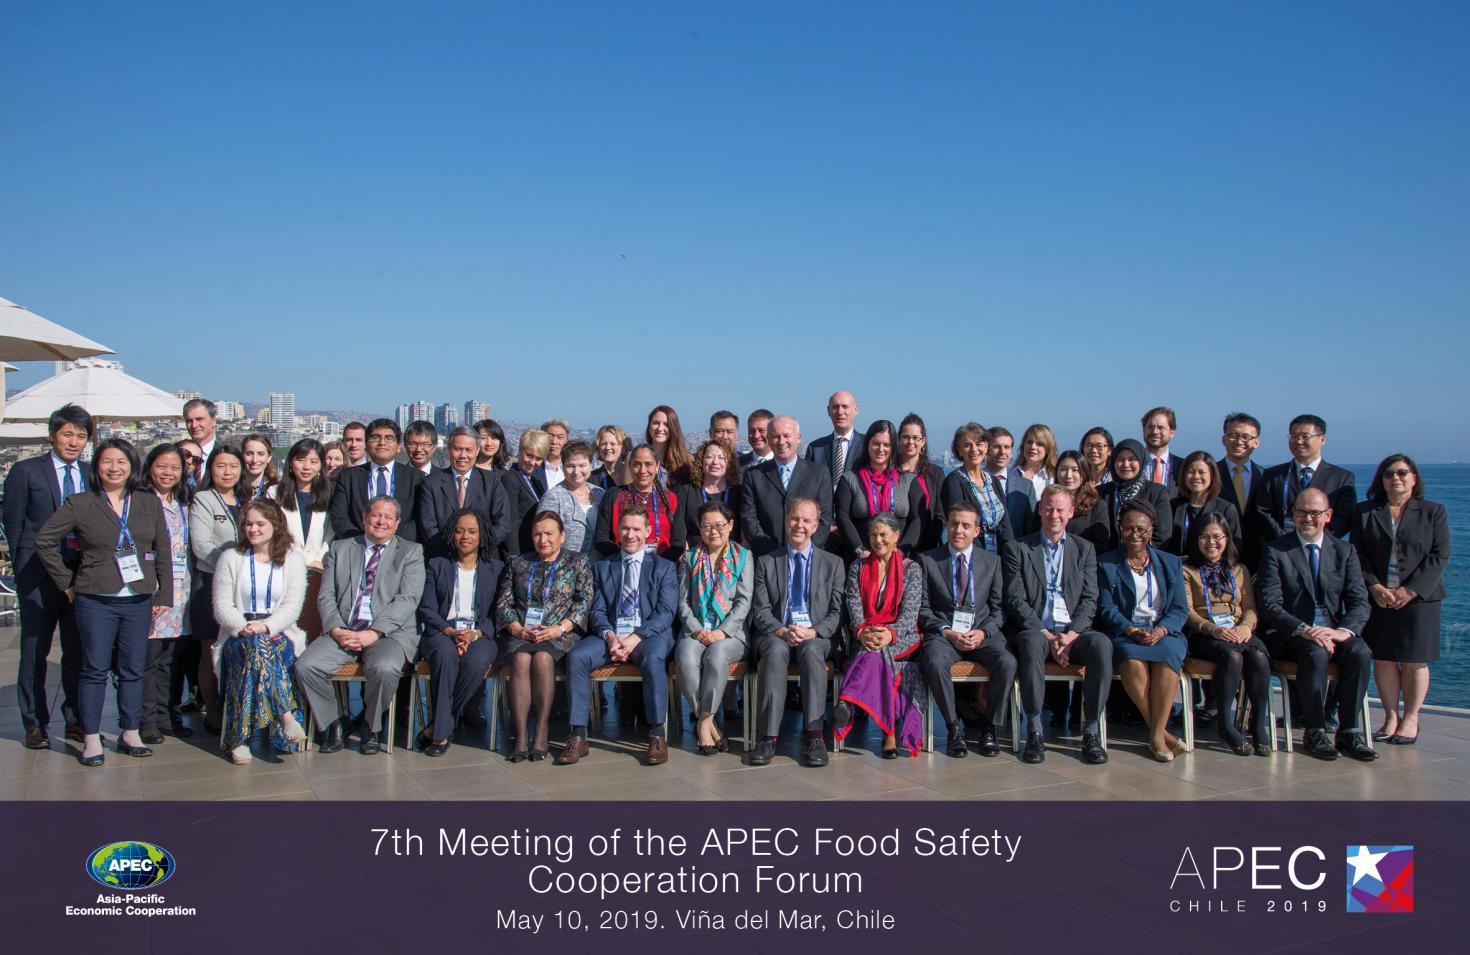 IICA presente en semana de la Inocuidad en APEC 2019 | Instituto